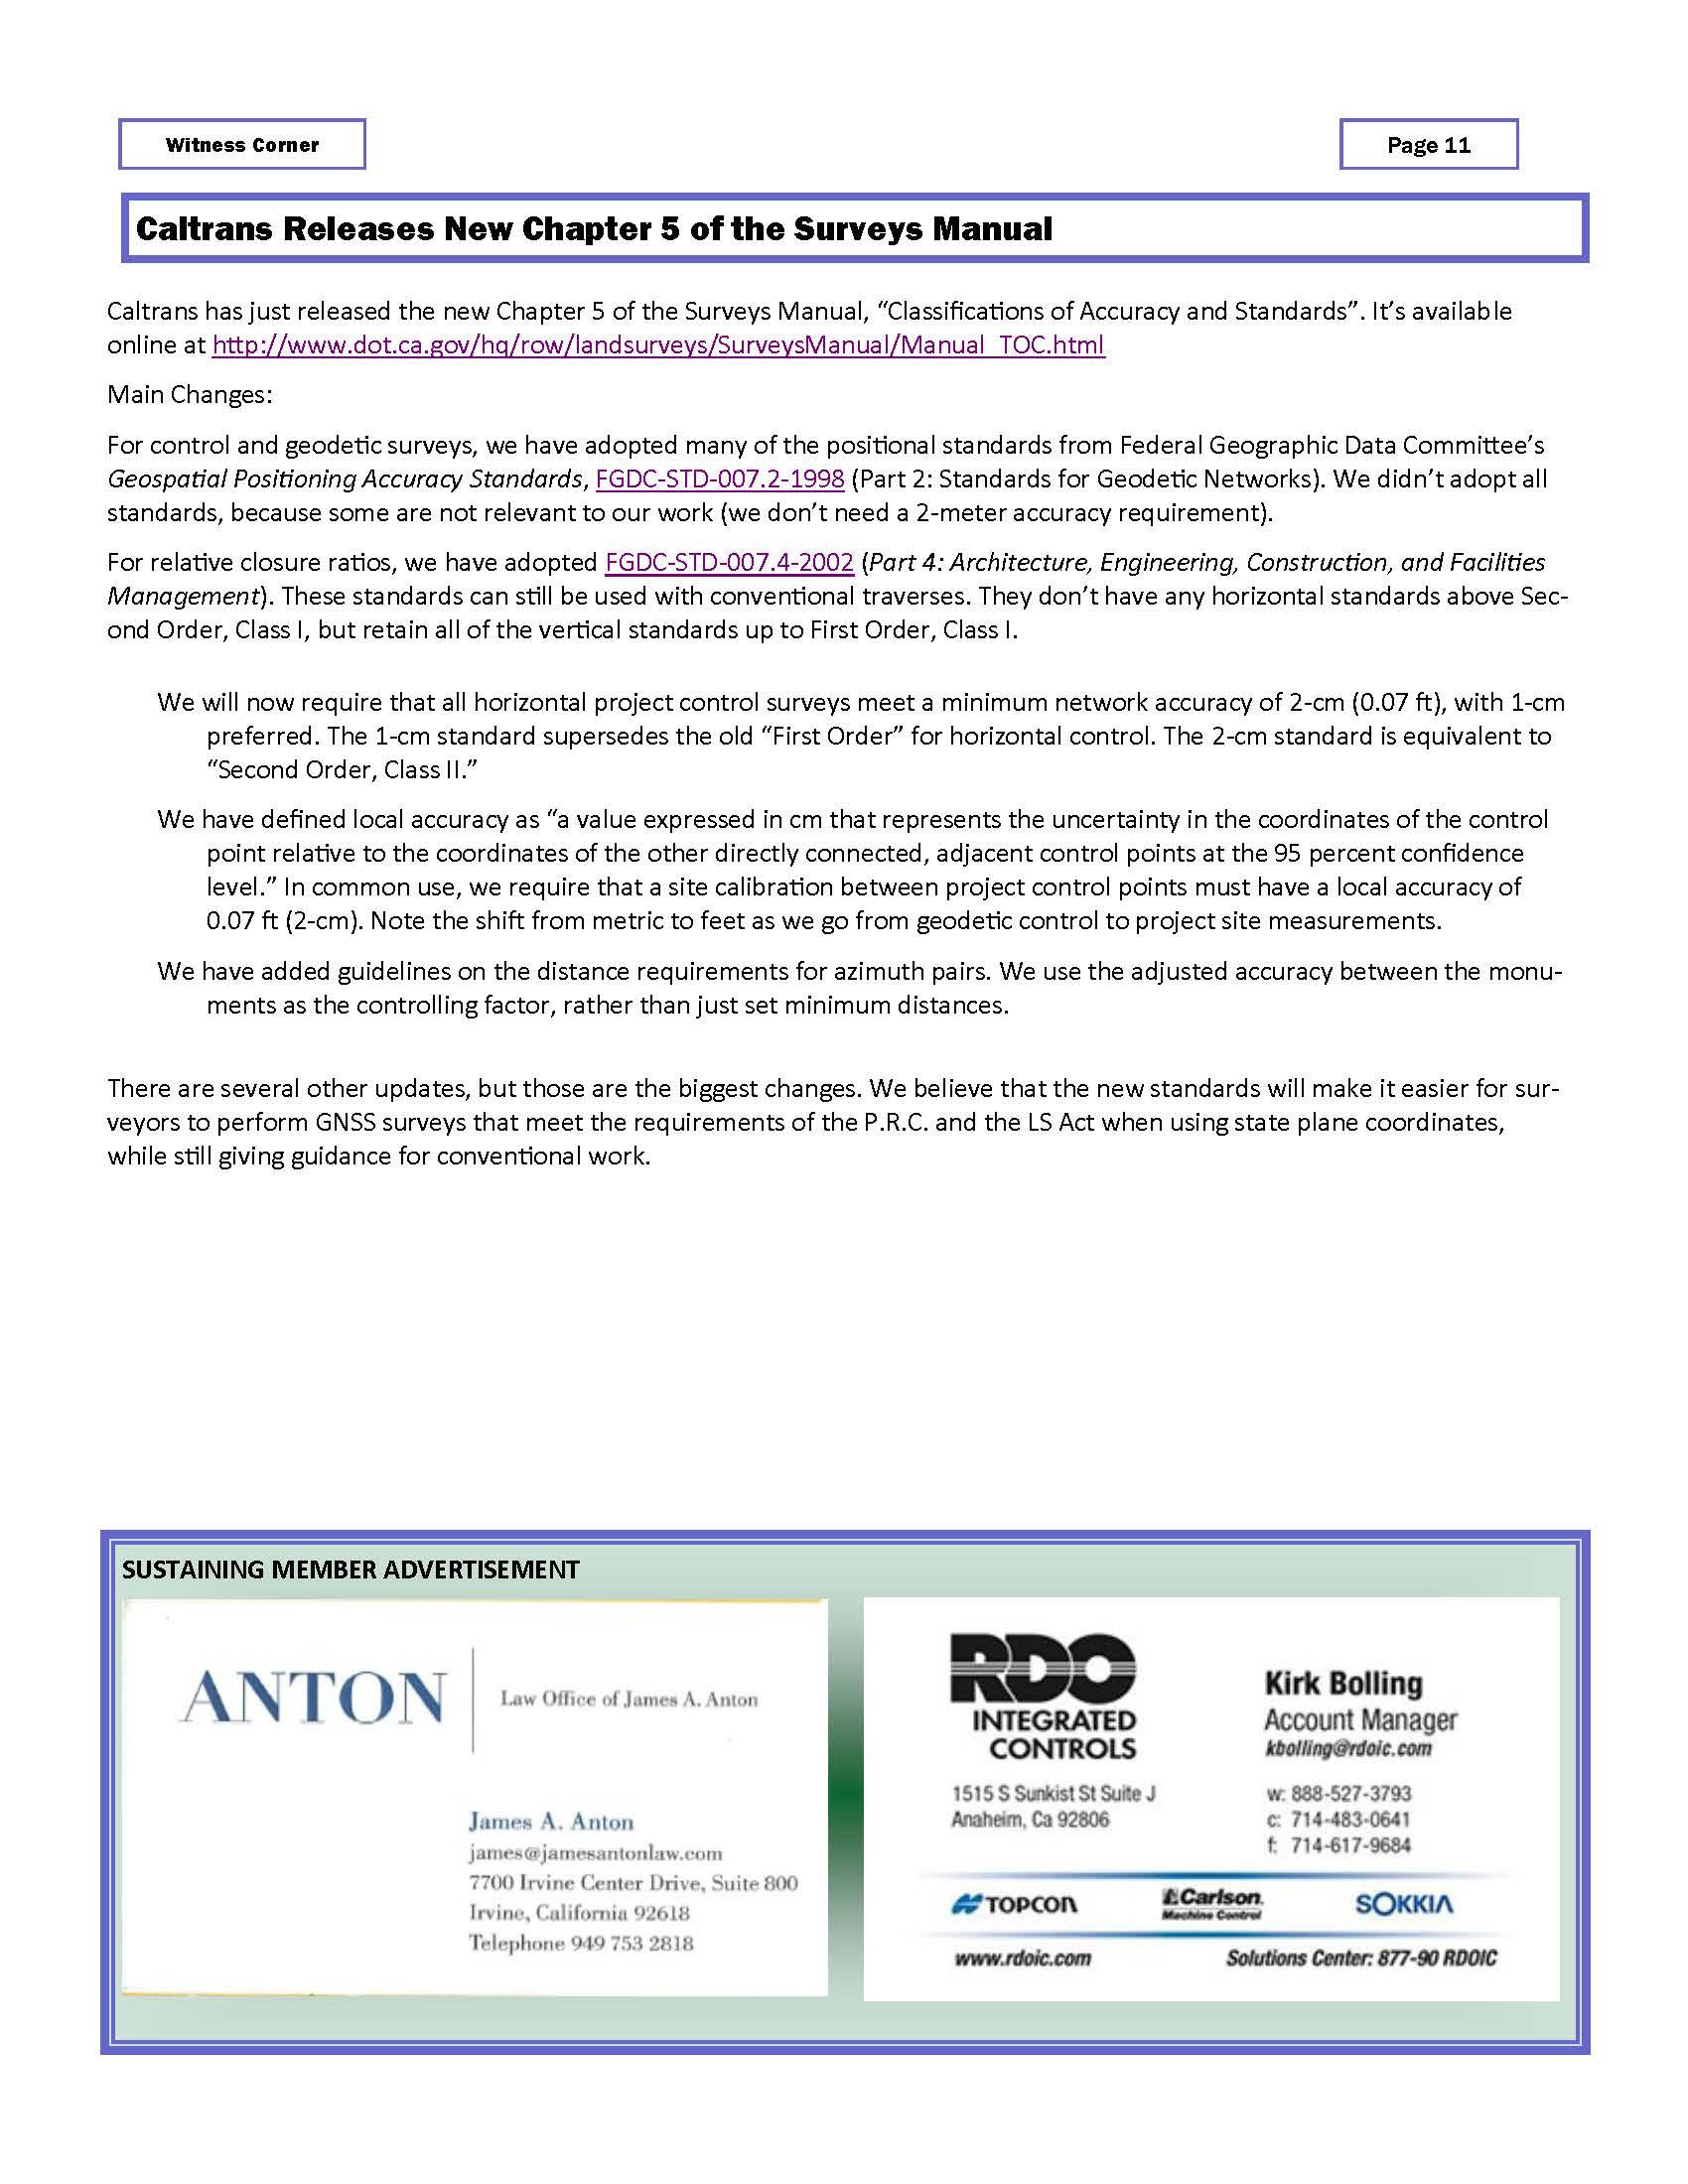 OC-CLSA 082015 Newsletter_Page_13.jpg